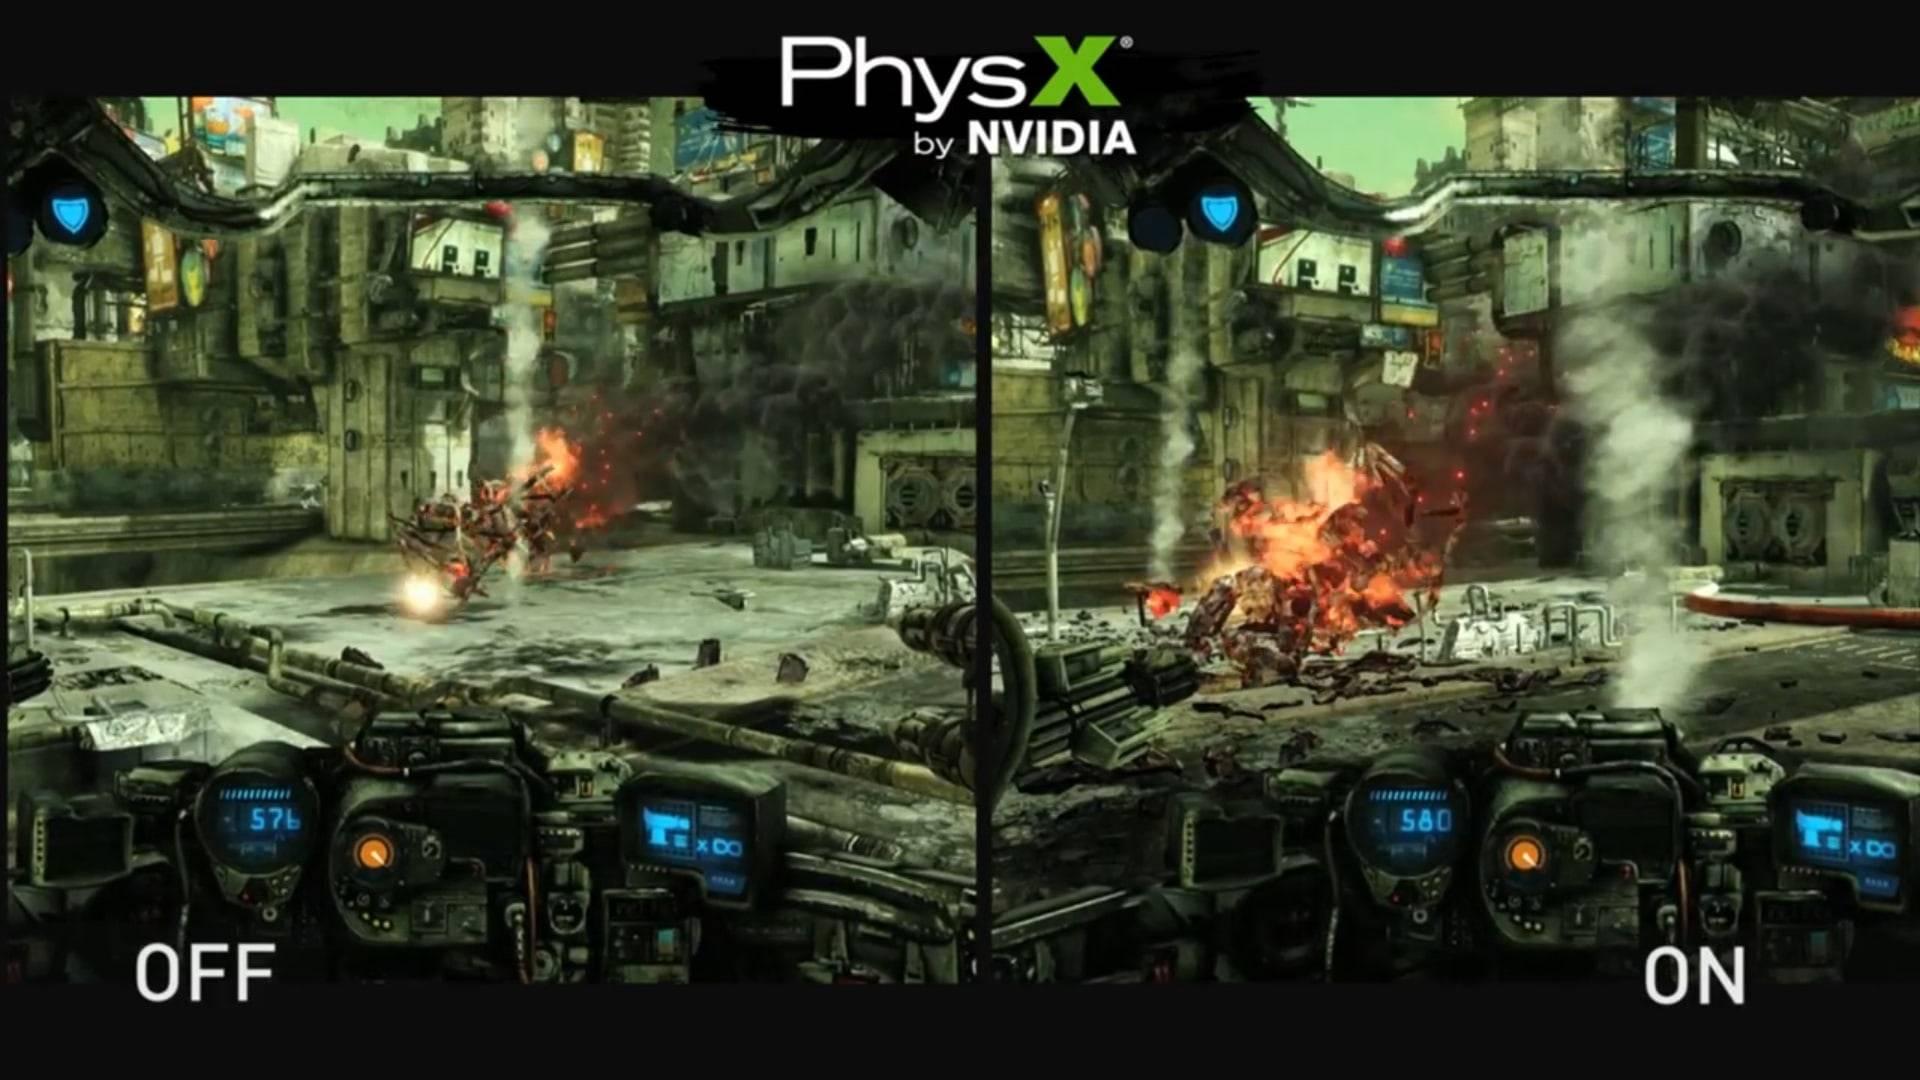 nvidia-physx-windows-10-1-min.jpg